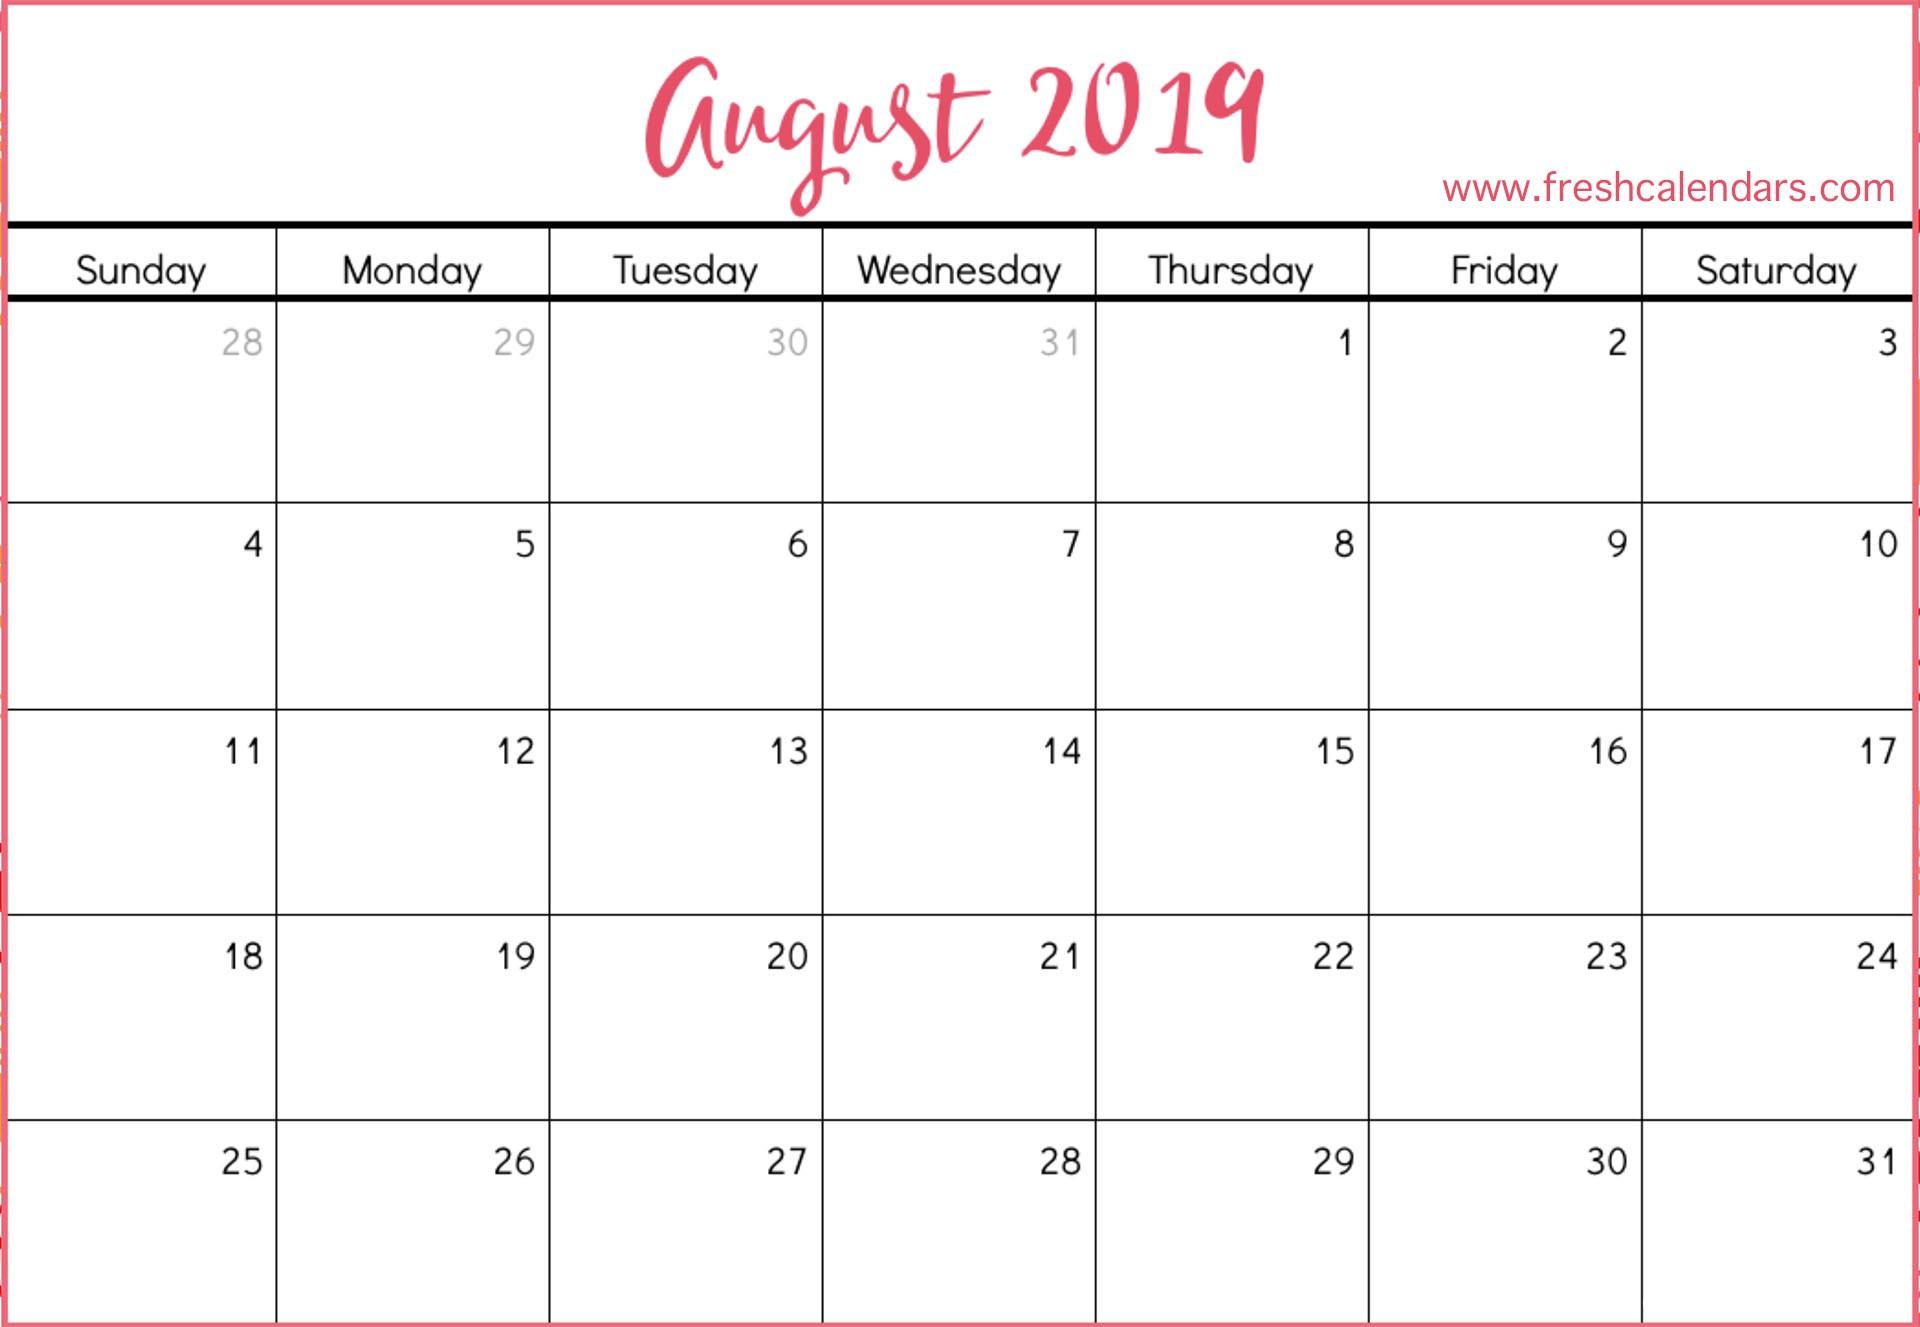 Printable August 2019 Calendar Printable August 2019 Calendar Fresh Calendars